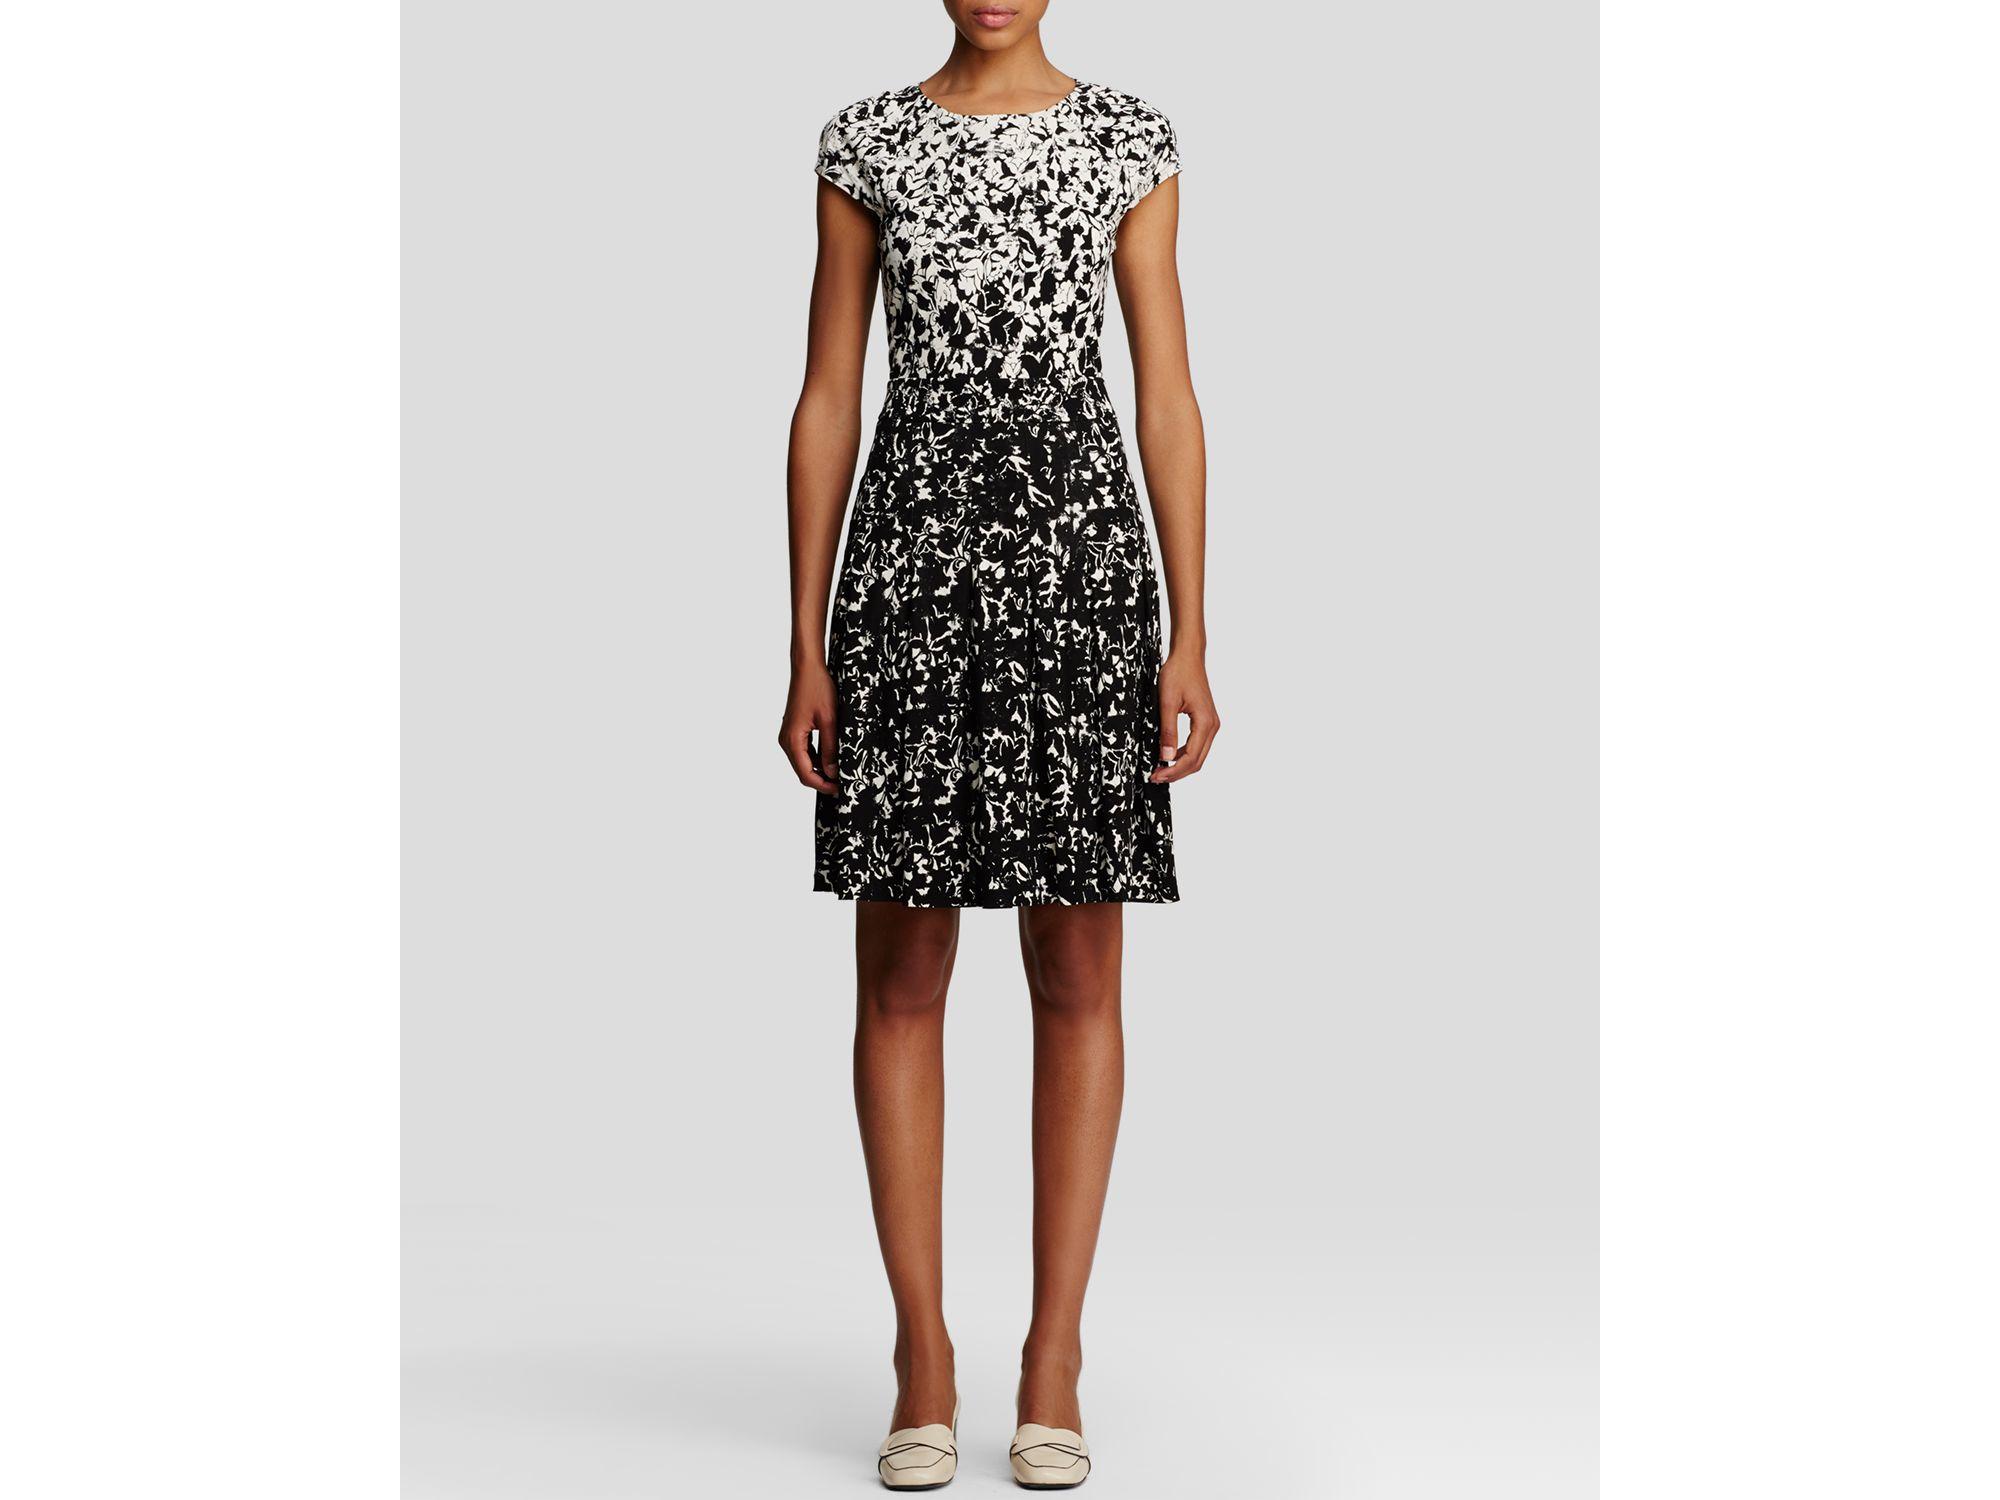 Lyst Tory Burch Sophia Color Block Floral Print Dress In